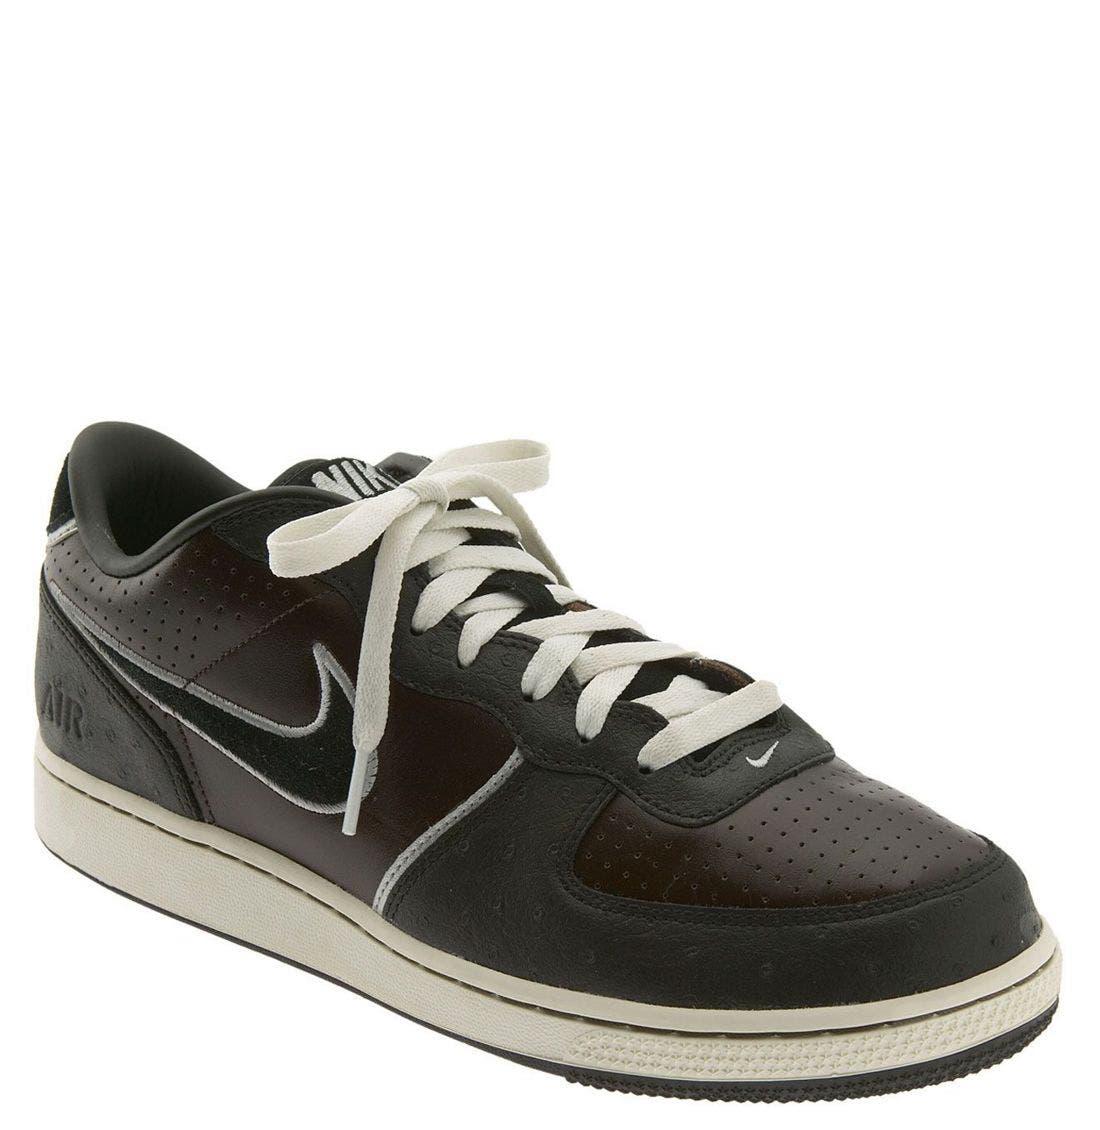 'Air Zoom Infiltrator Premium' Athletic Shoe,                             Main thumbnail 1, color,                             RPV